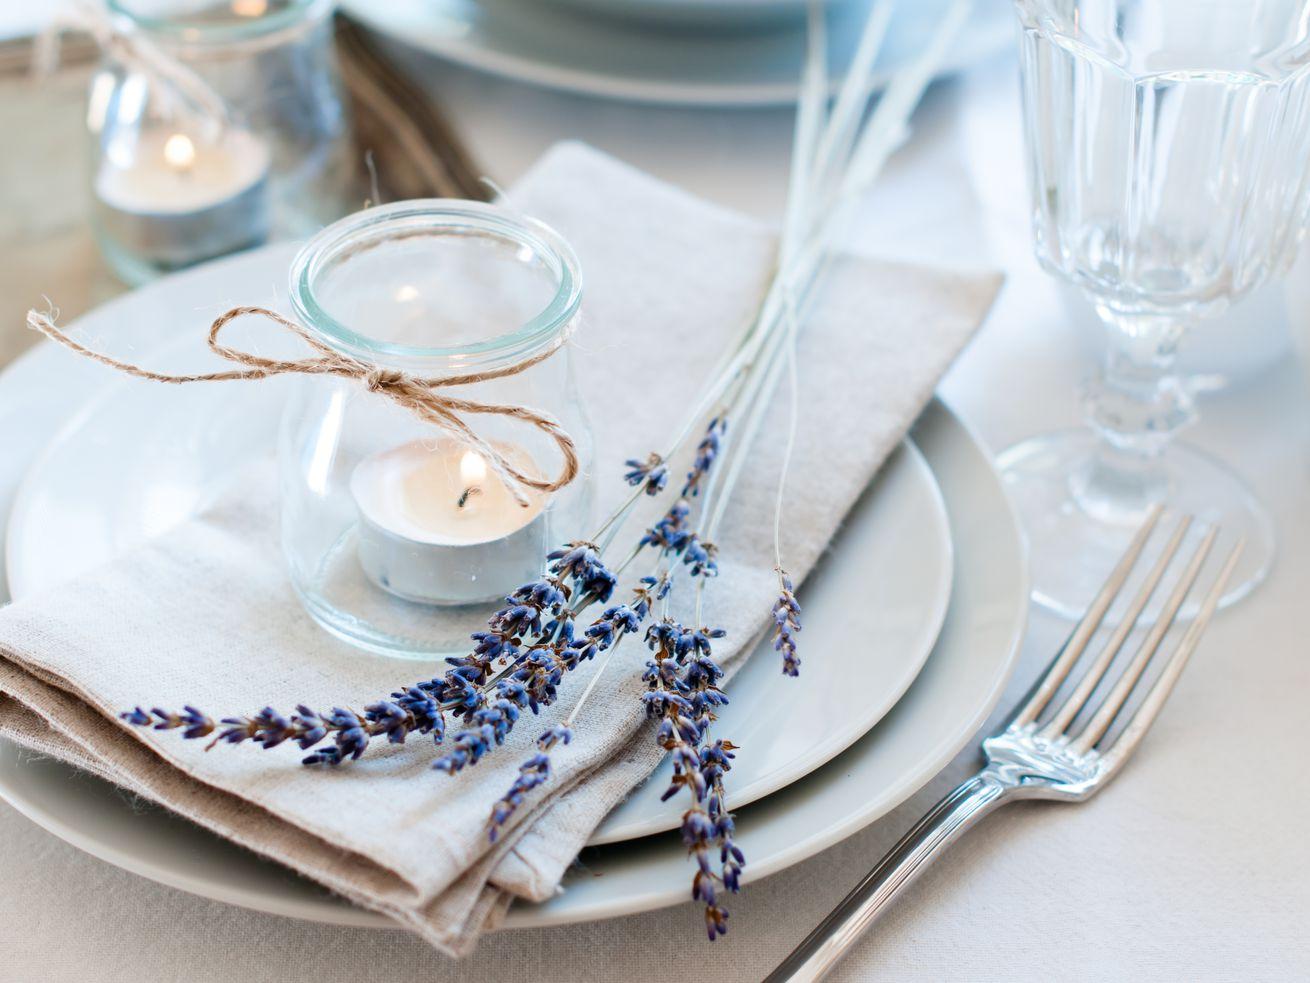 Tea lights add a soft glow to this dinner setup.